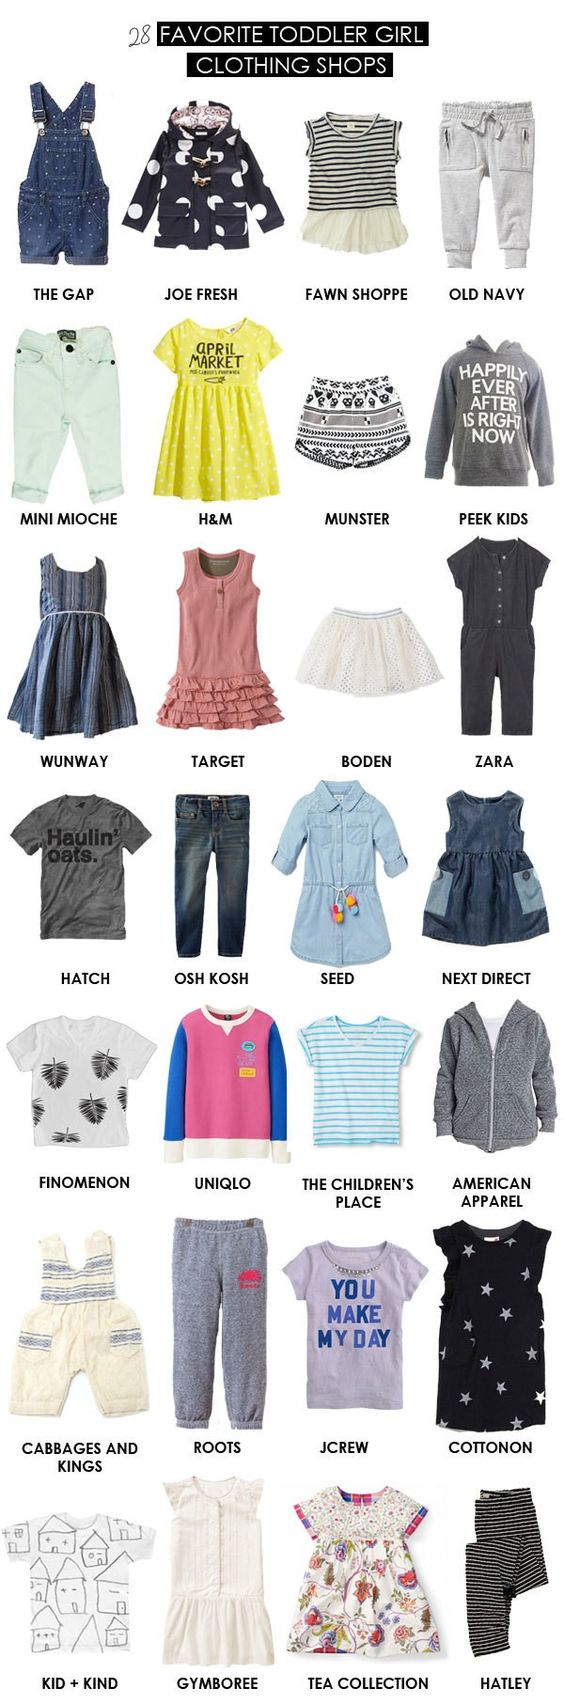 favorite toddler girl clothing stores